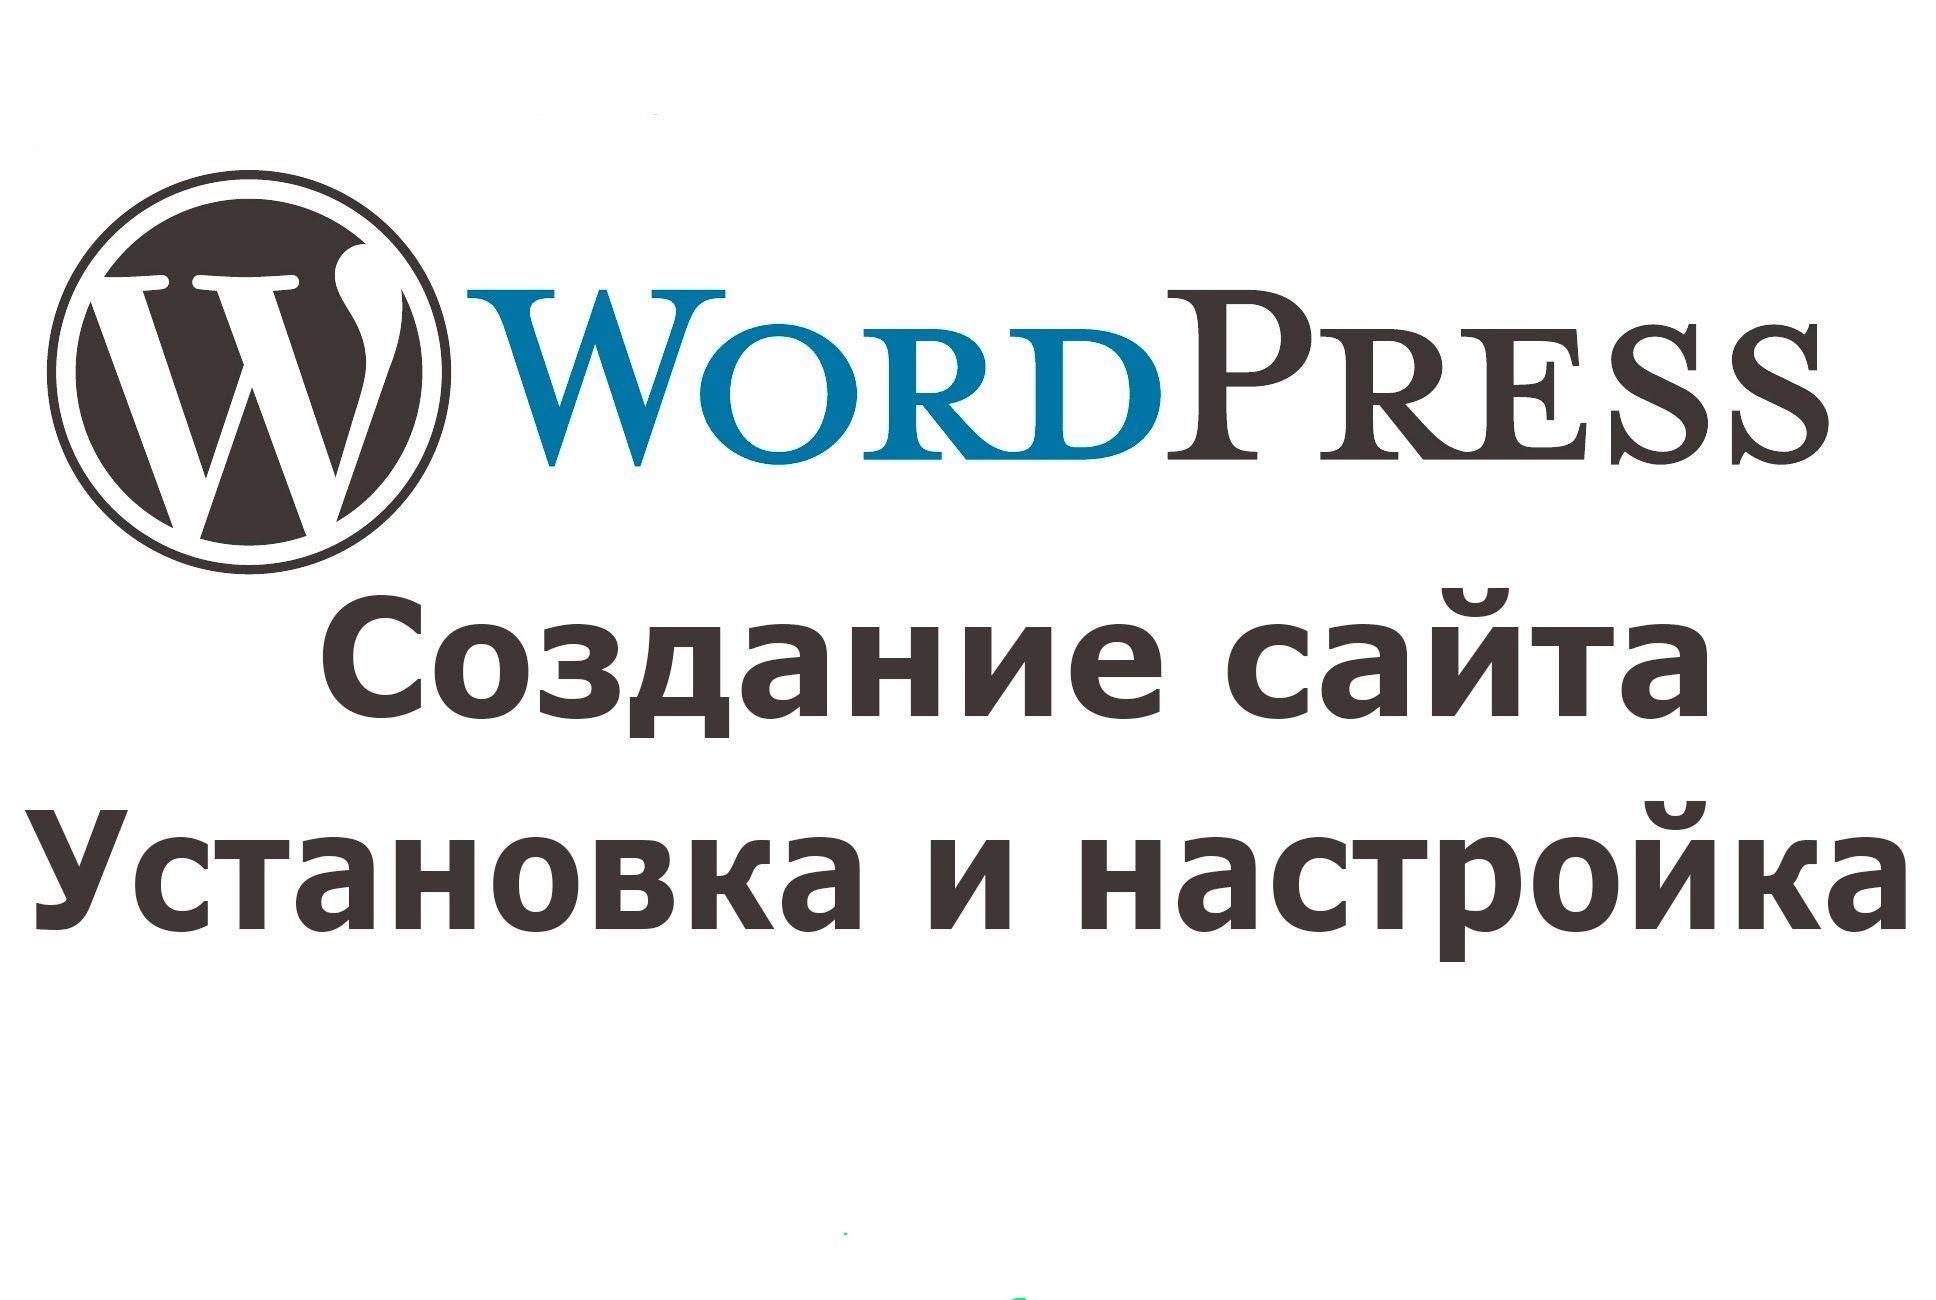 Создание сайта на wordpress скачать создание сайта в якутске